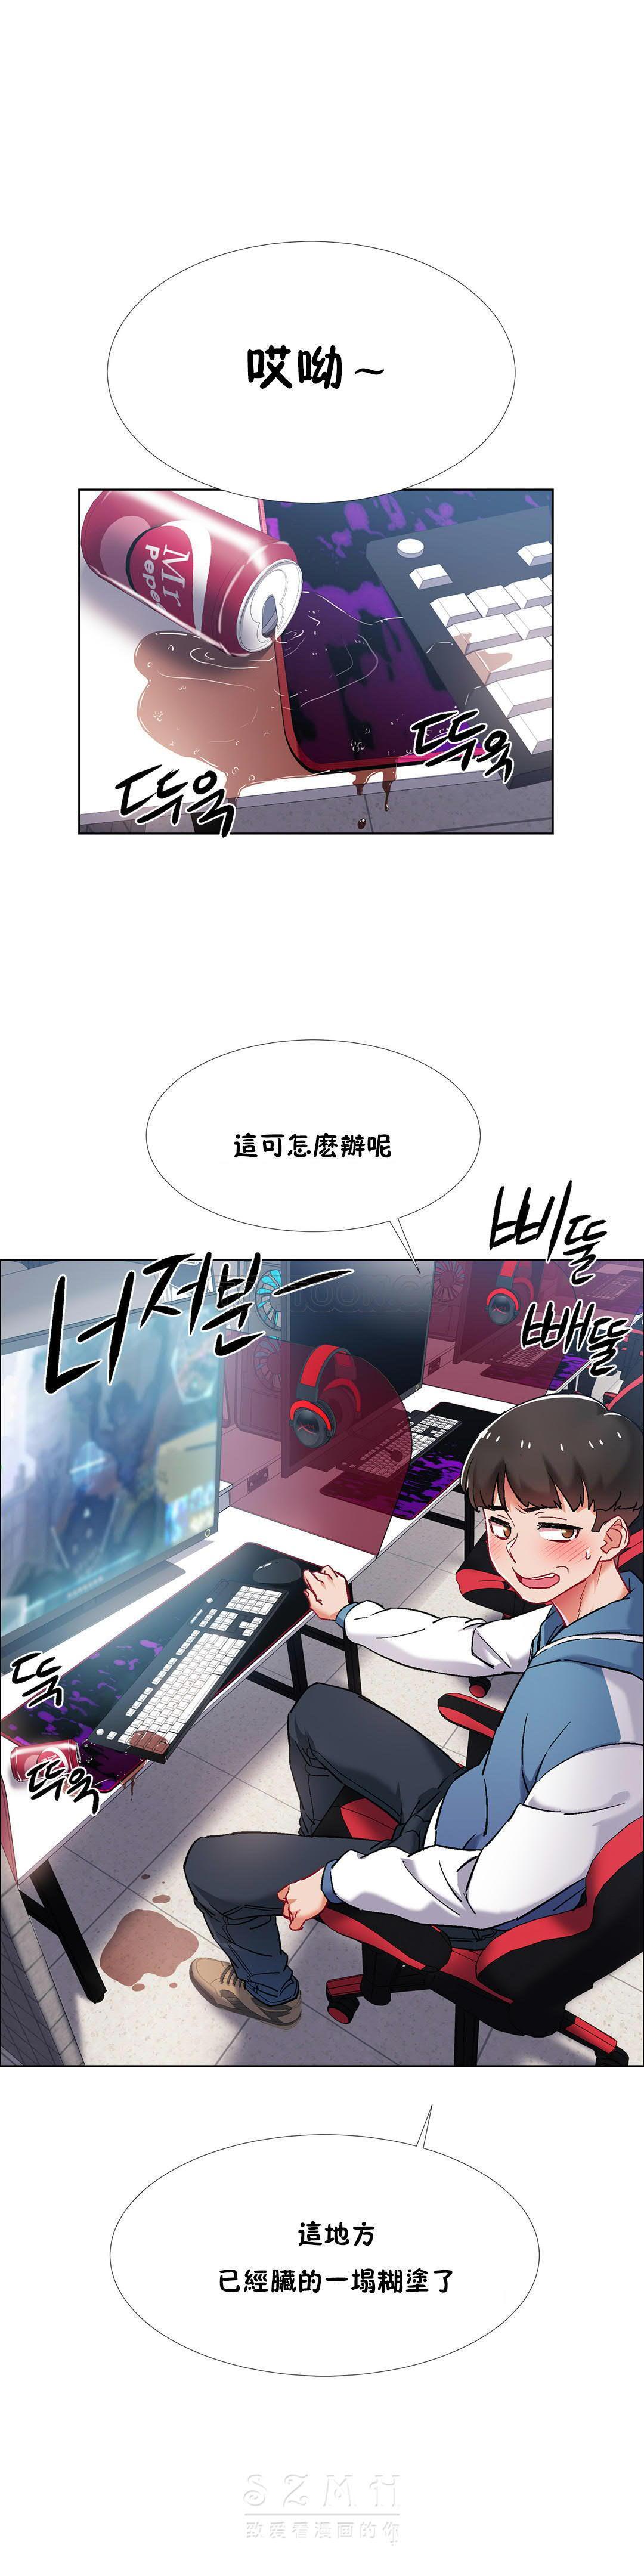 [Studio Wannabe] Rental Girls | 出租女郎 Ch. 33-58 [Chinese]  第二季 完结 50